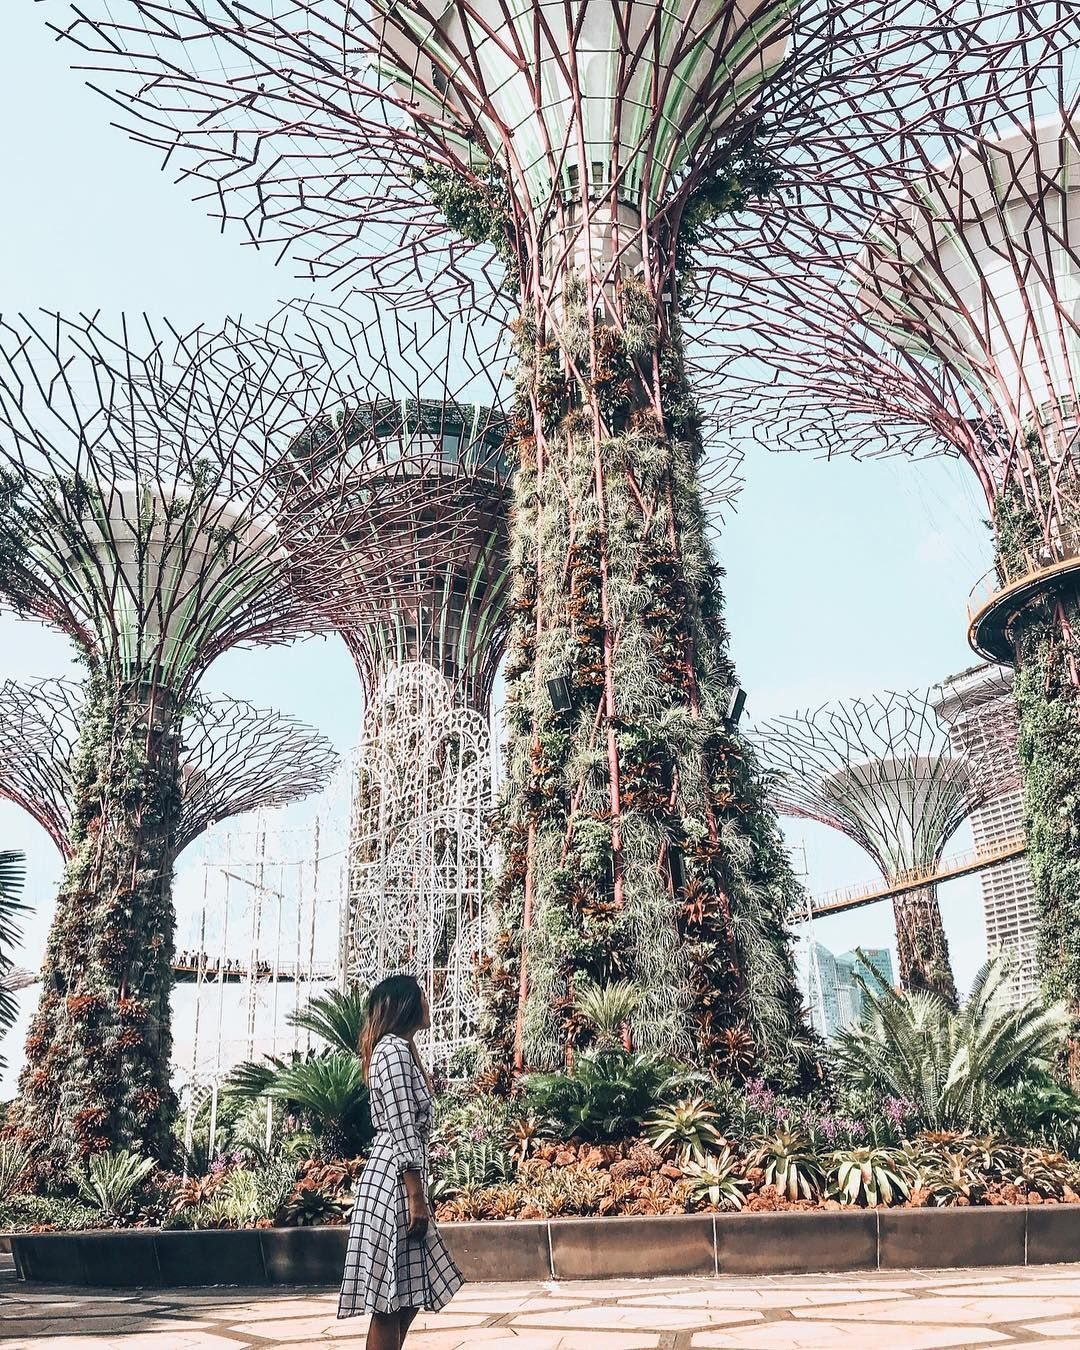 c5c8c5dbc97311b4ba2f7402df65d21f - Supertree Grove Gardens By The Bay Singapore